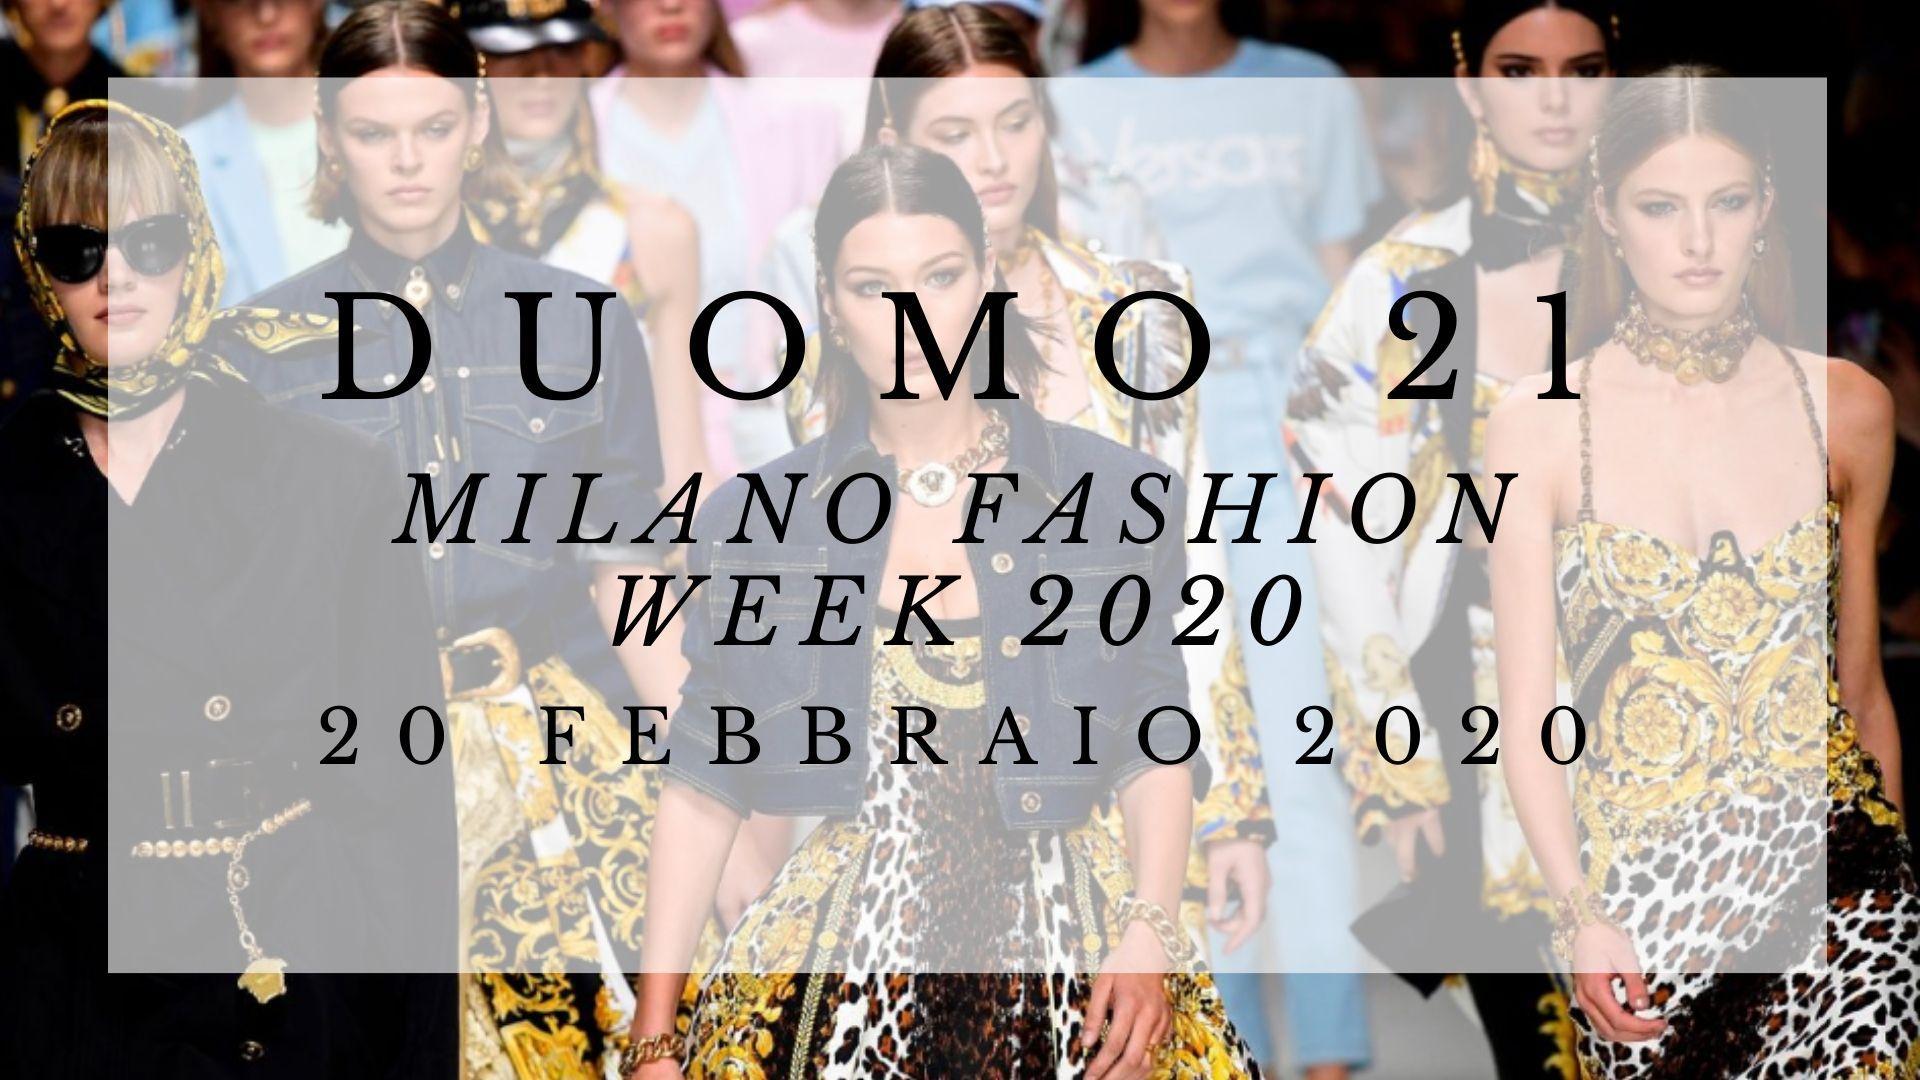 CFM / Milano Fashion Week 2020 @TerrazzaDuomo21